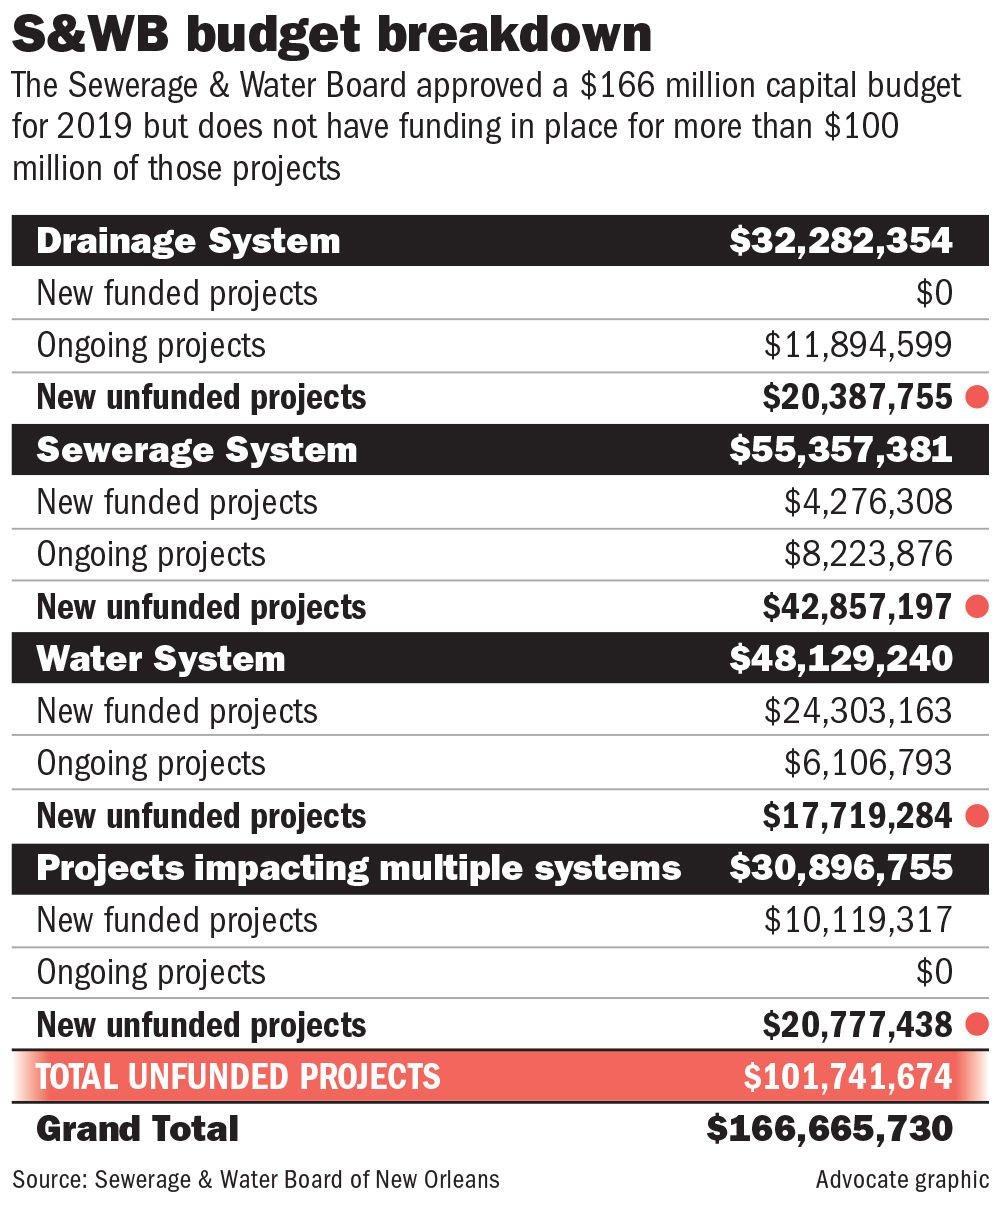 122218 SWB budget breakdown.jpg